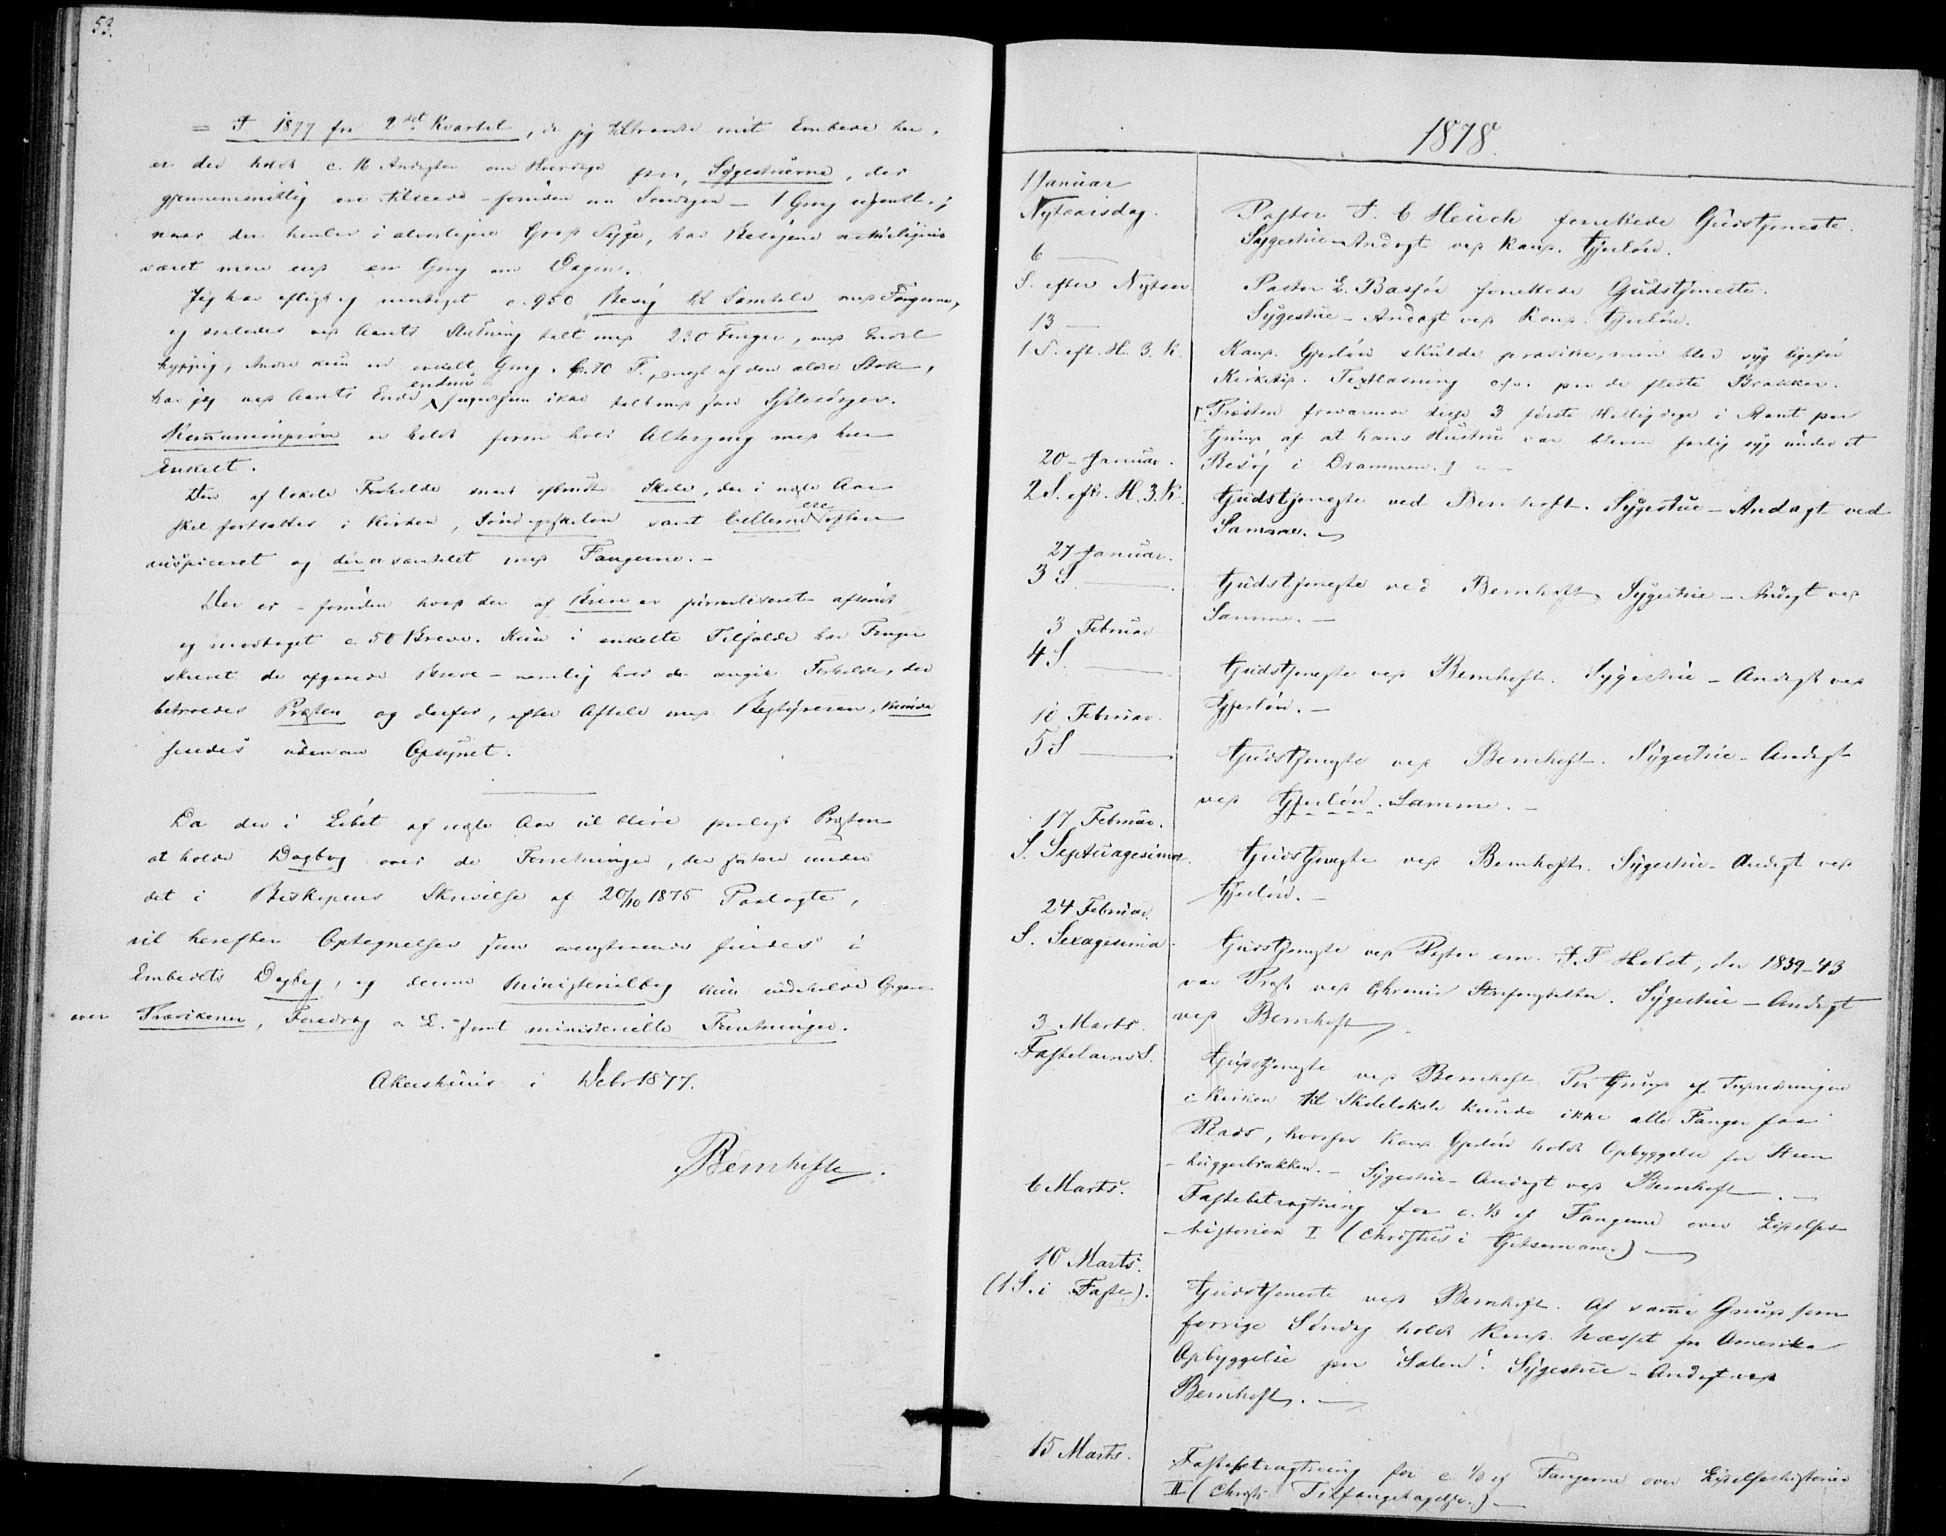 SAO, Akershus festnings slaveri Kirkebøker, F/Fa/L0002: Ministerialbok nr. 2, 1852-1883, s. 53